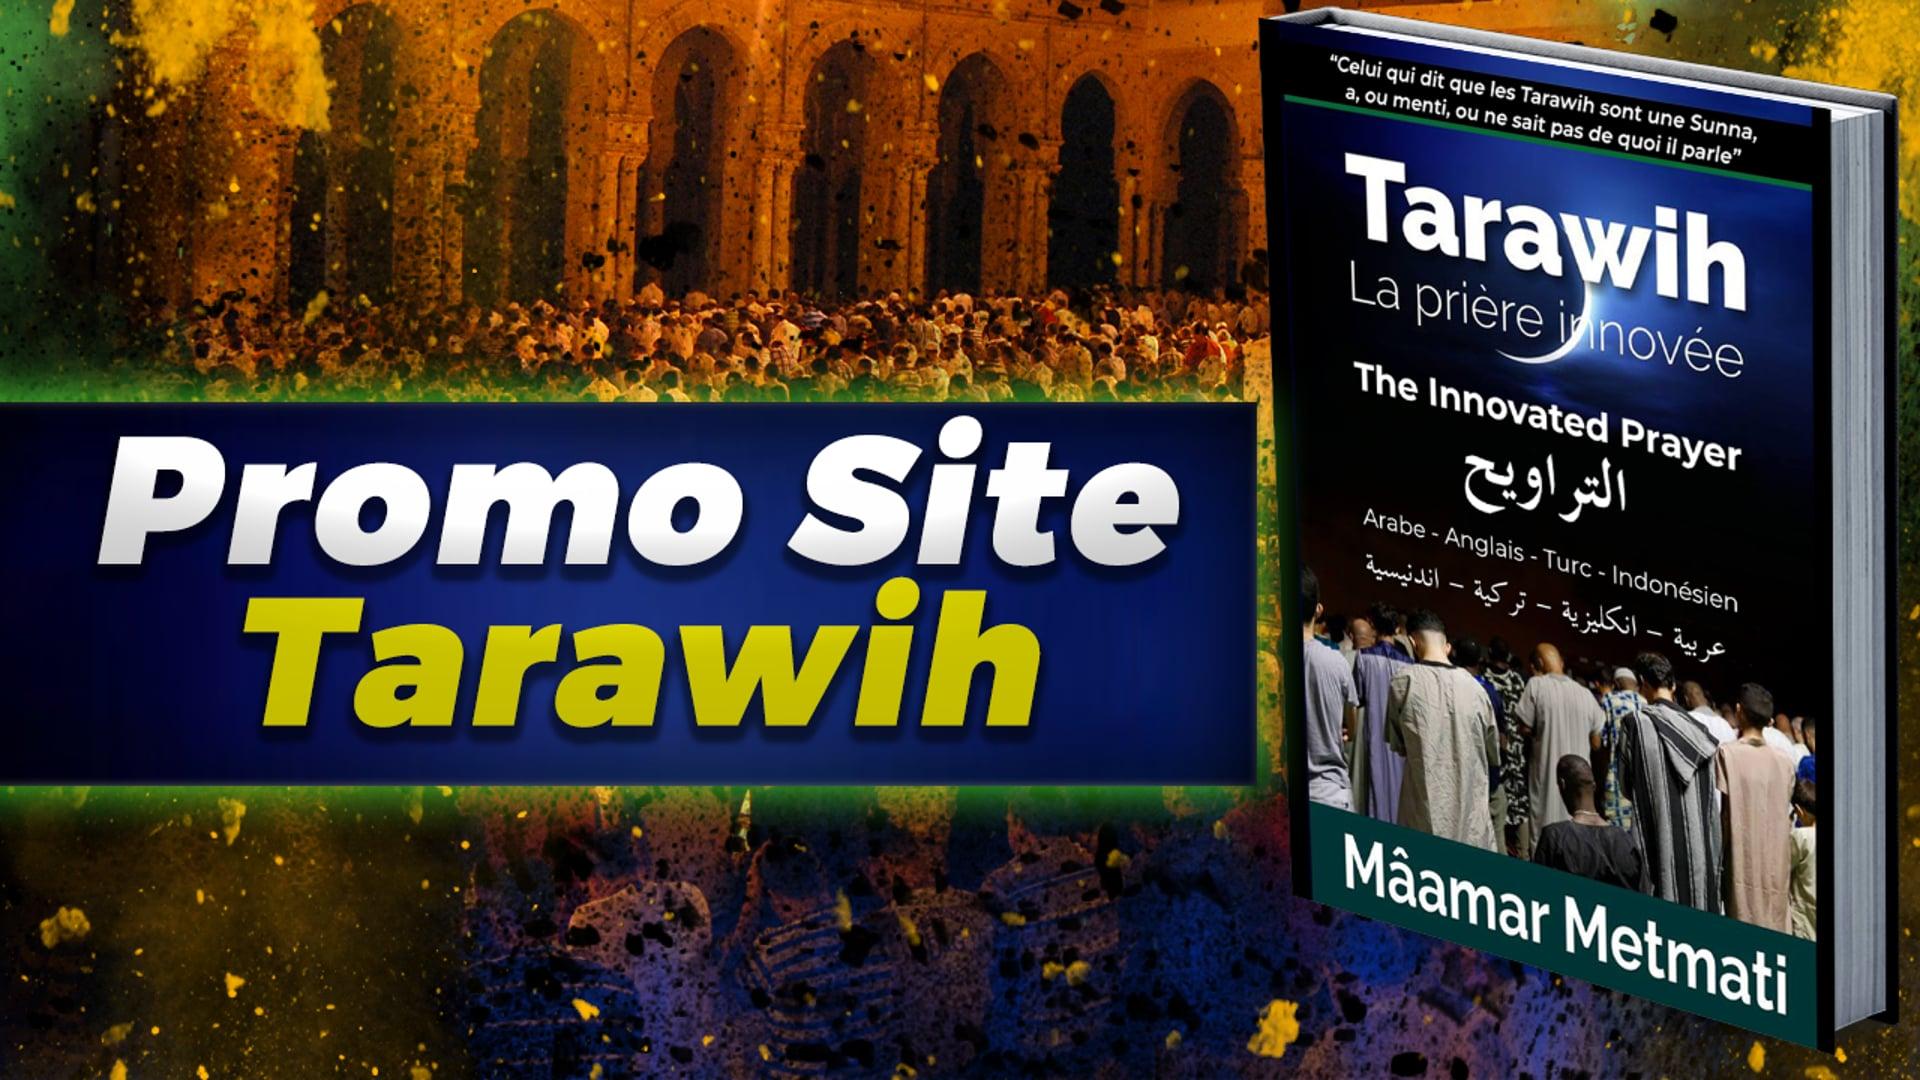 Promo Site Tarawih